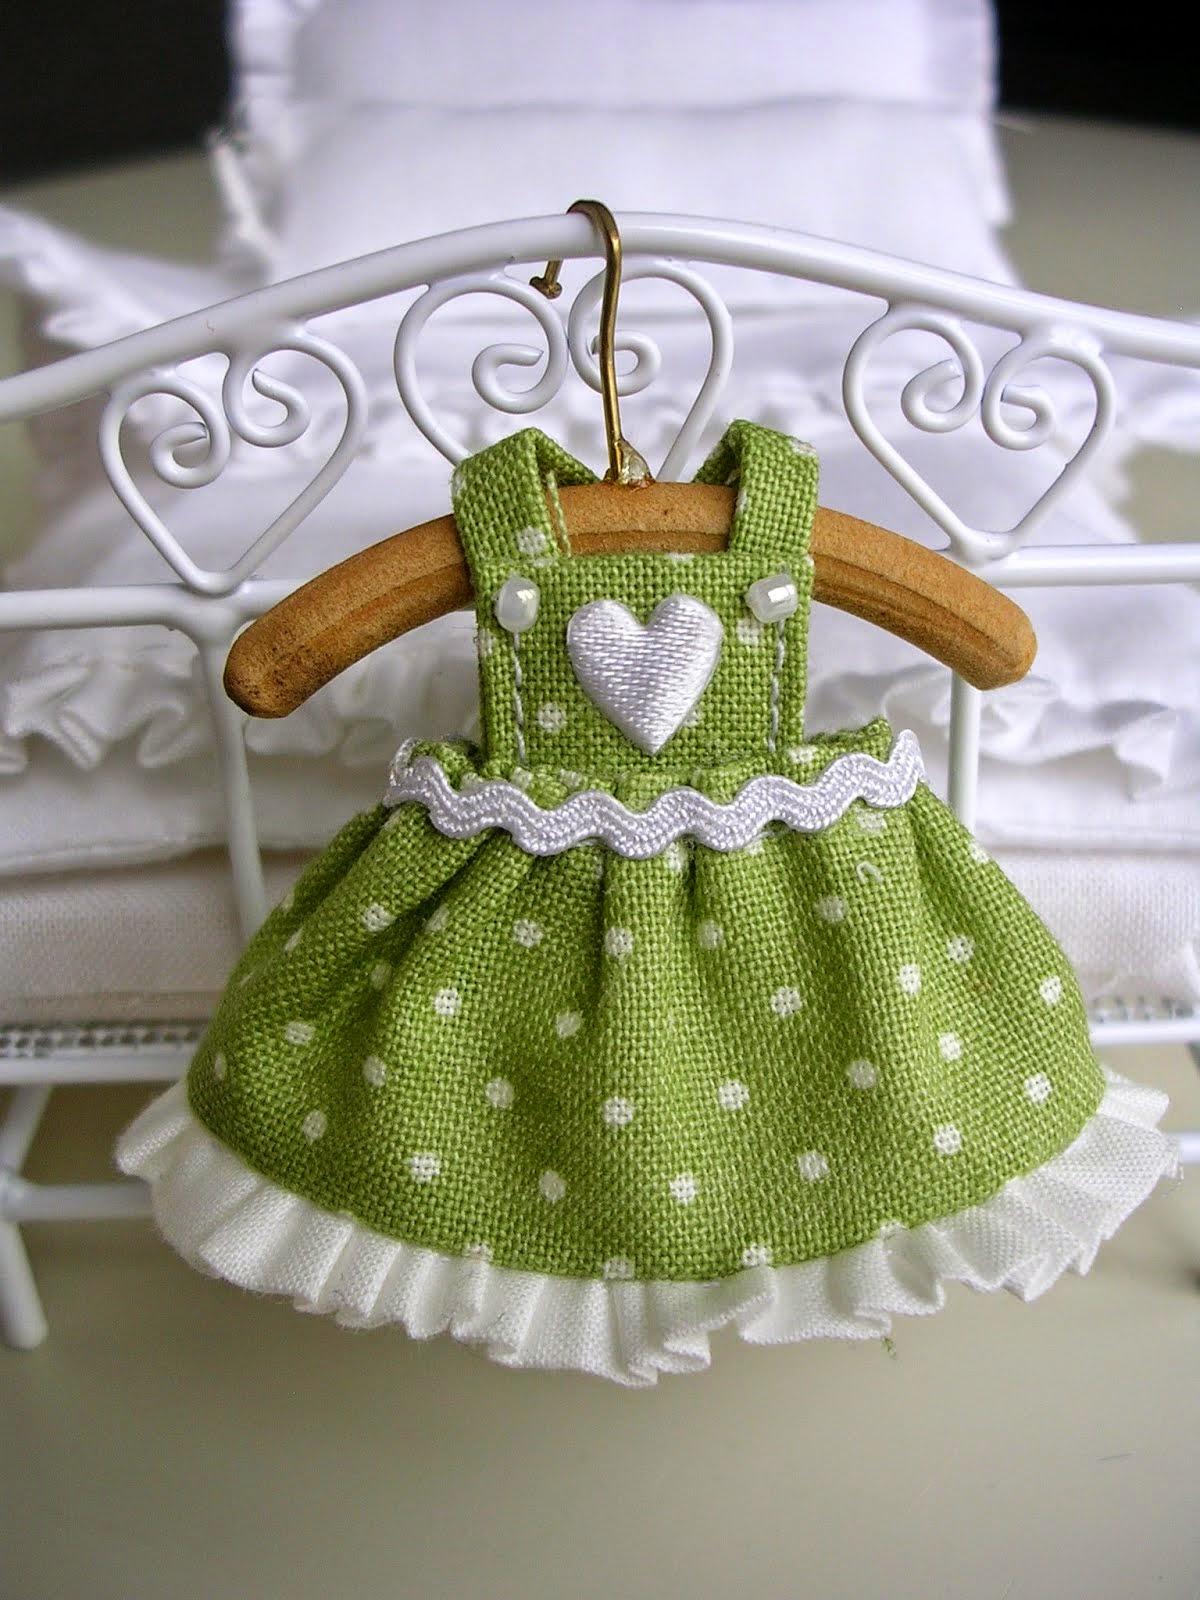 Sukienka zielona - skala 1:12